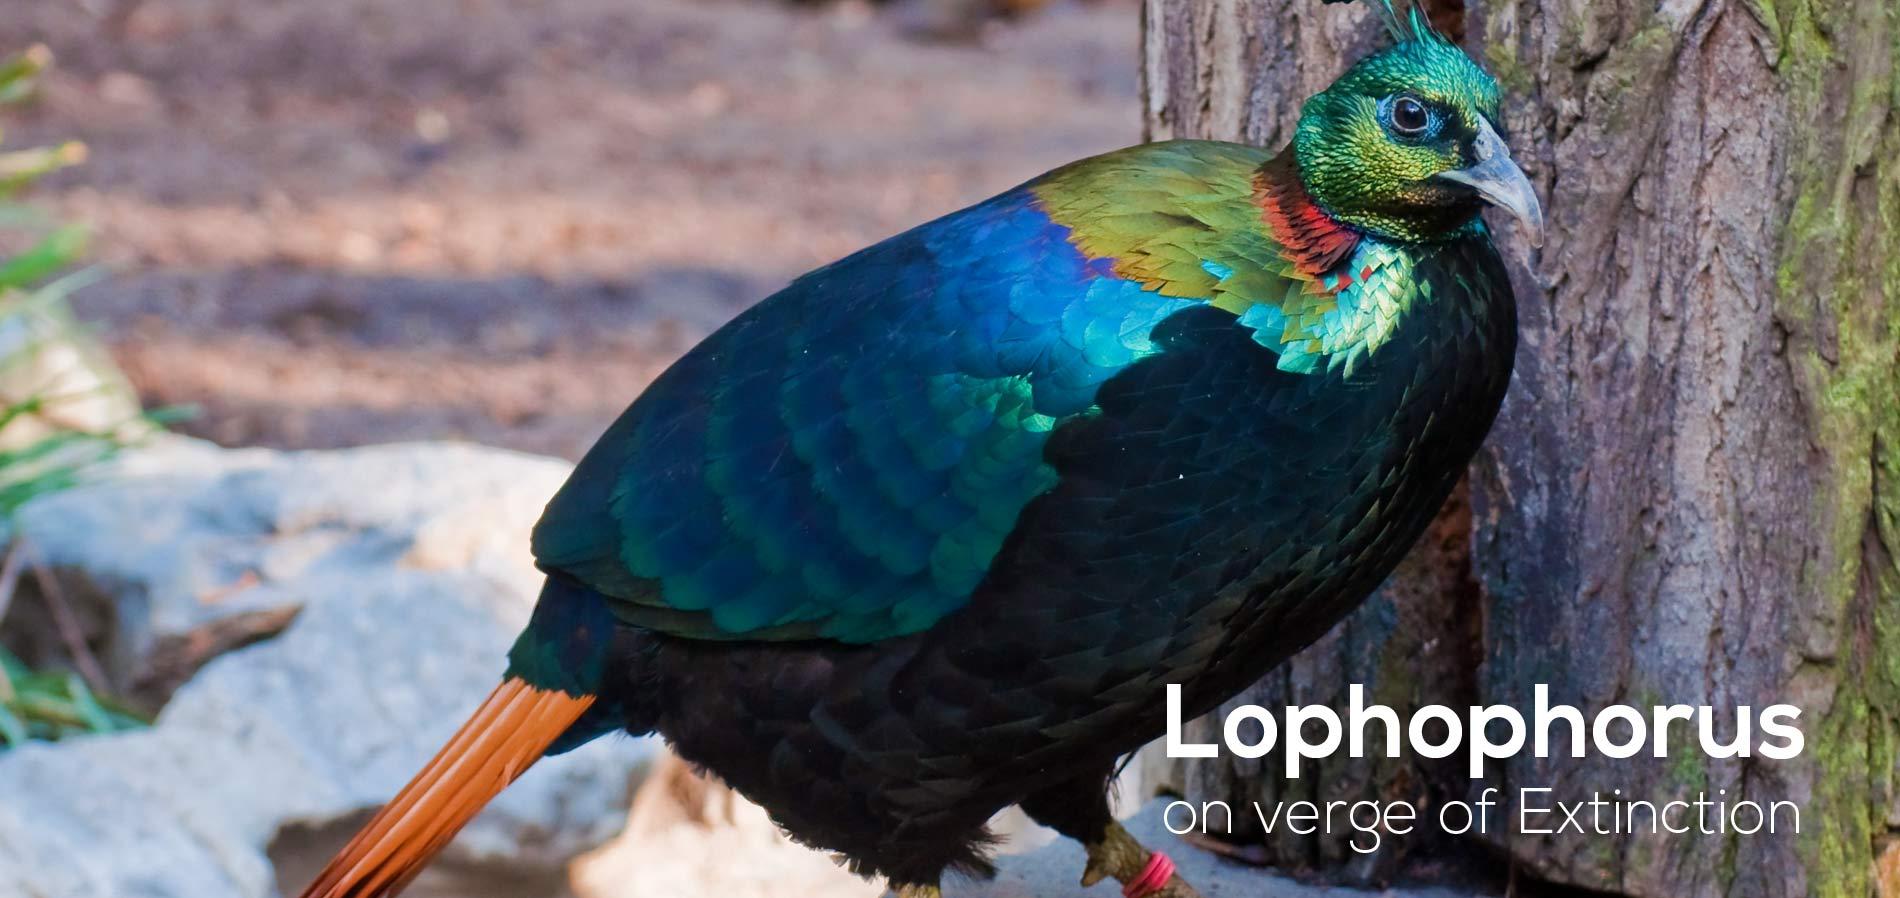 Lophophorus